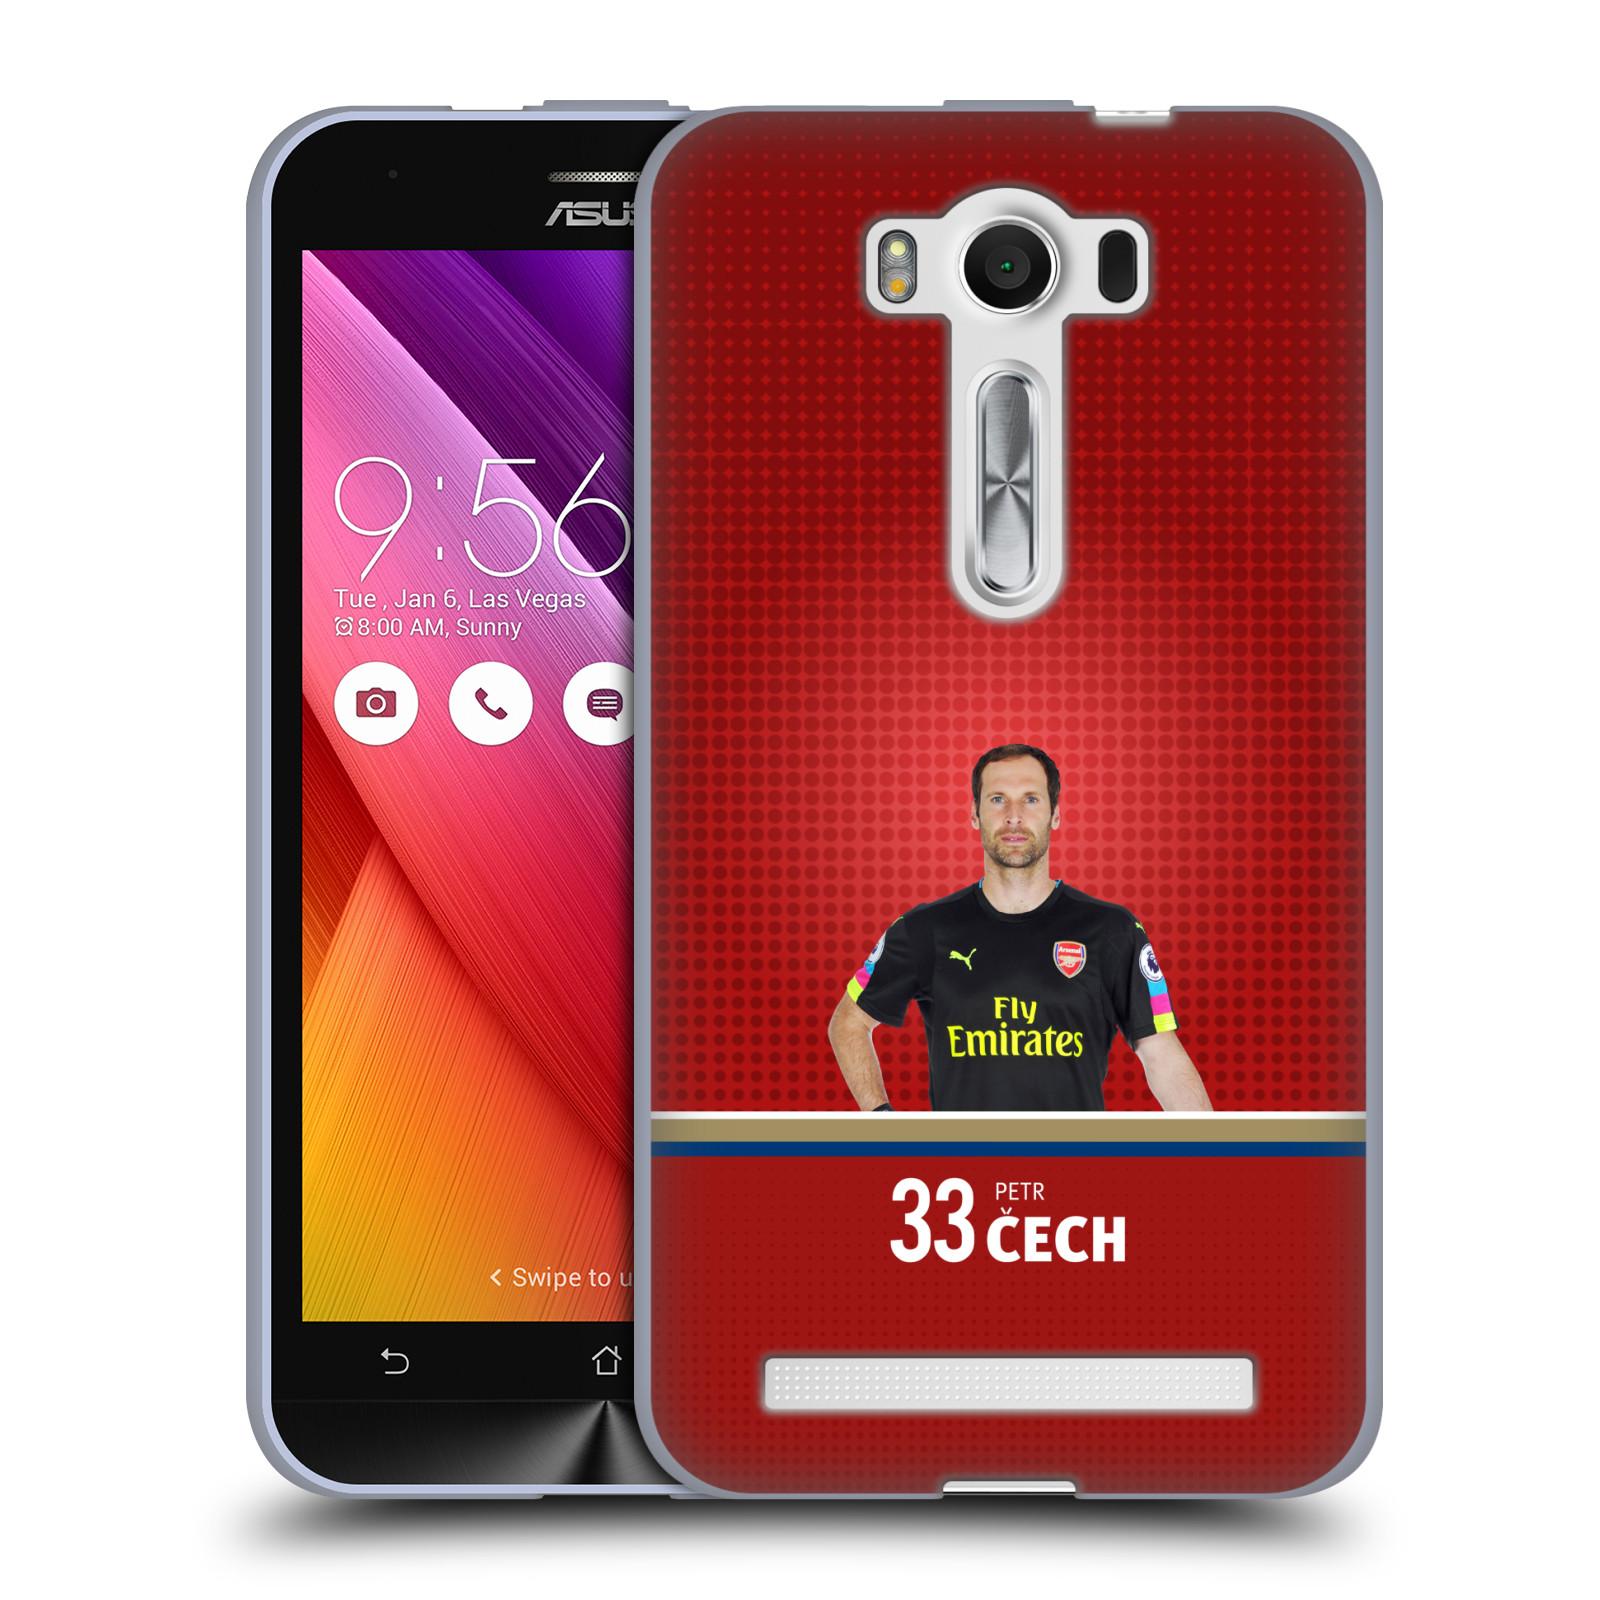 Silikonové pouzdro na mobil Asus ZenFone 2 Laser ZE500KL - Head Case - Arsenal FC - Petr Čech